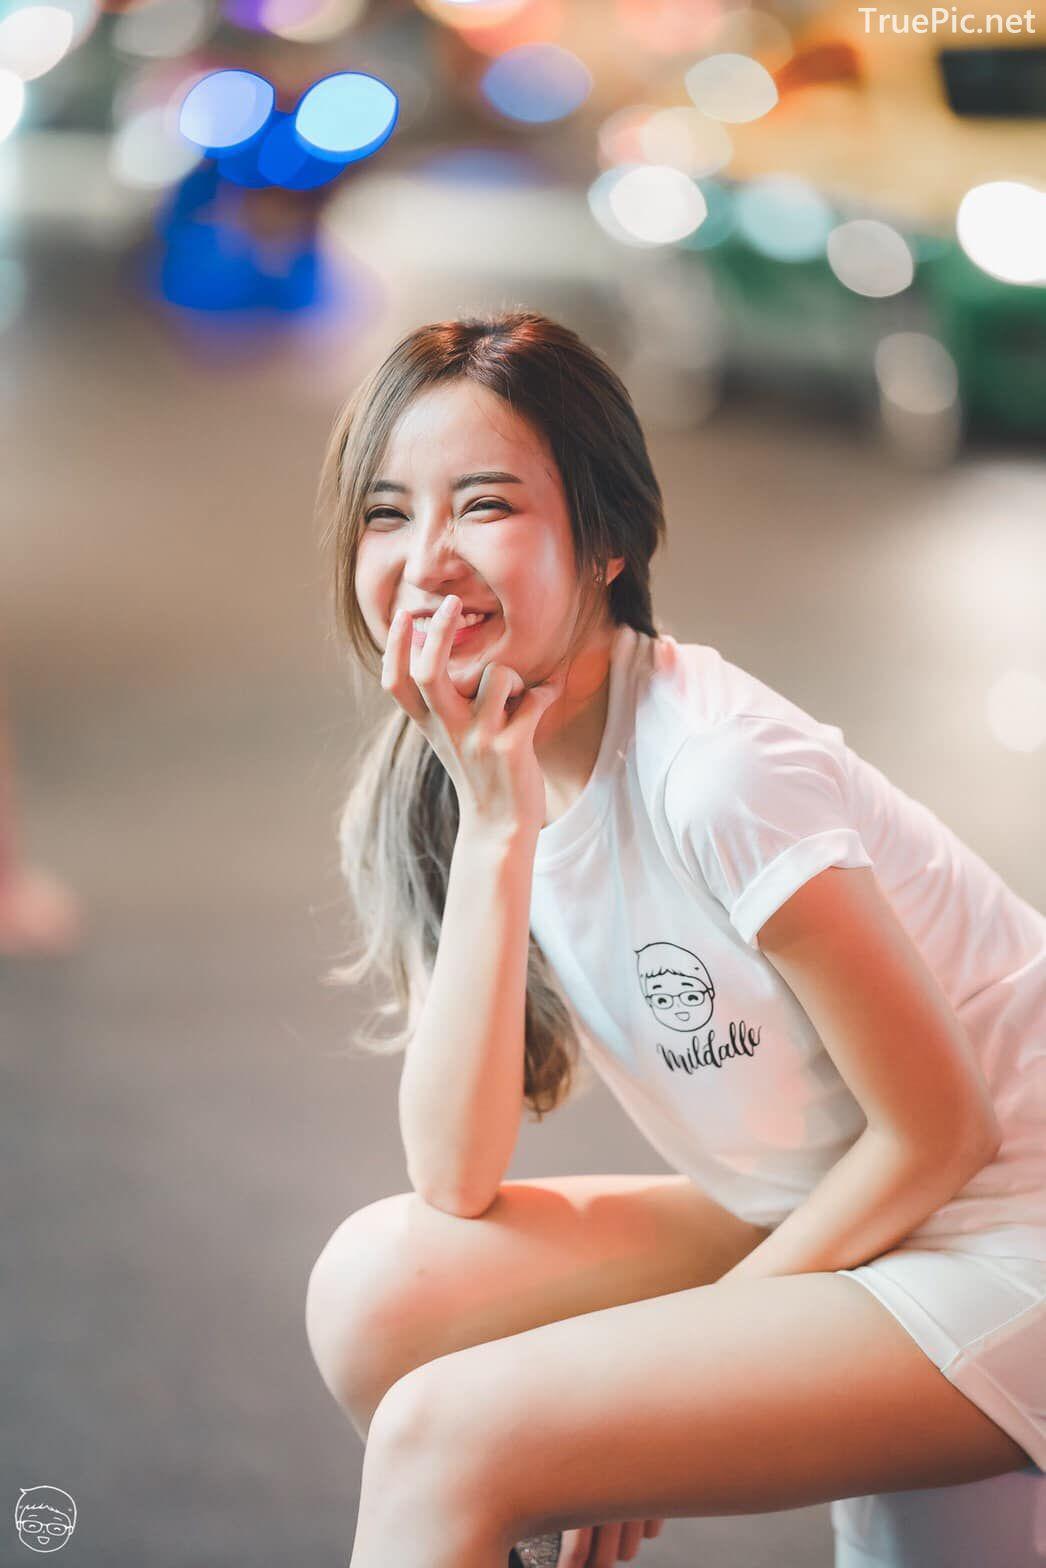 Thailand Hot Girl - Thanyarat Charoenpornkittada - Bustling City Tours - TruePic.net - Picture 5